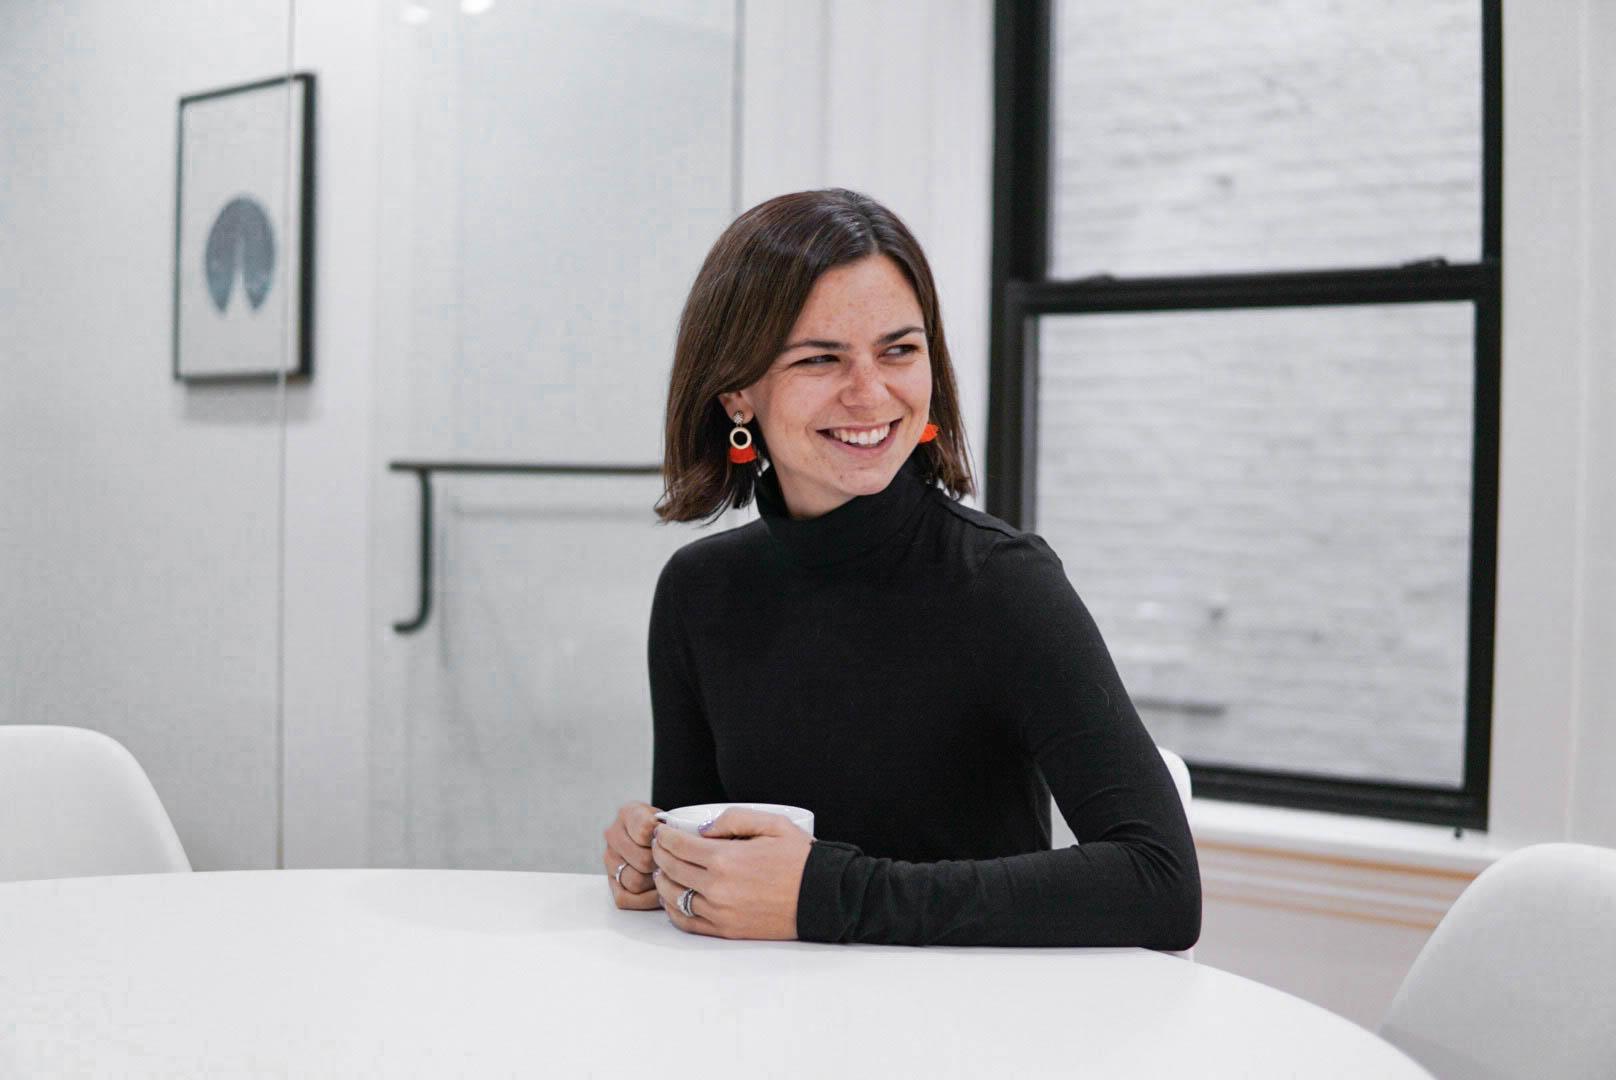 Meredith Engelen